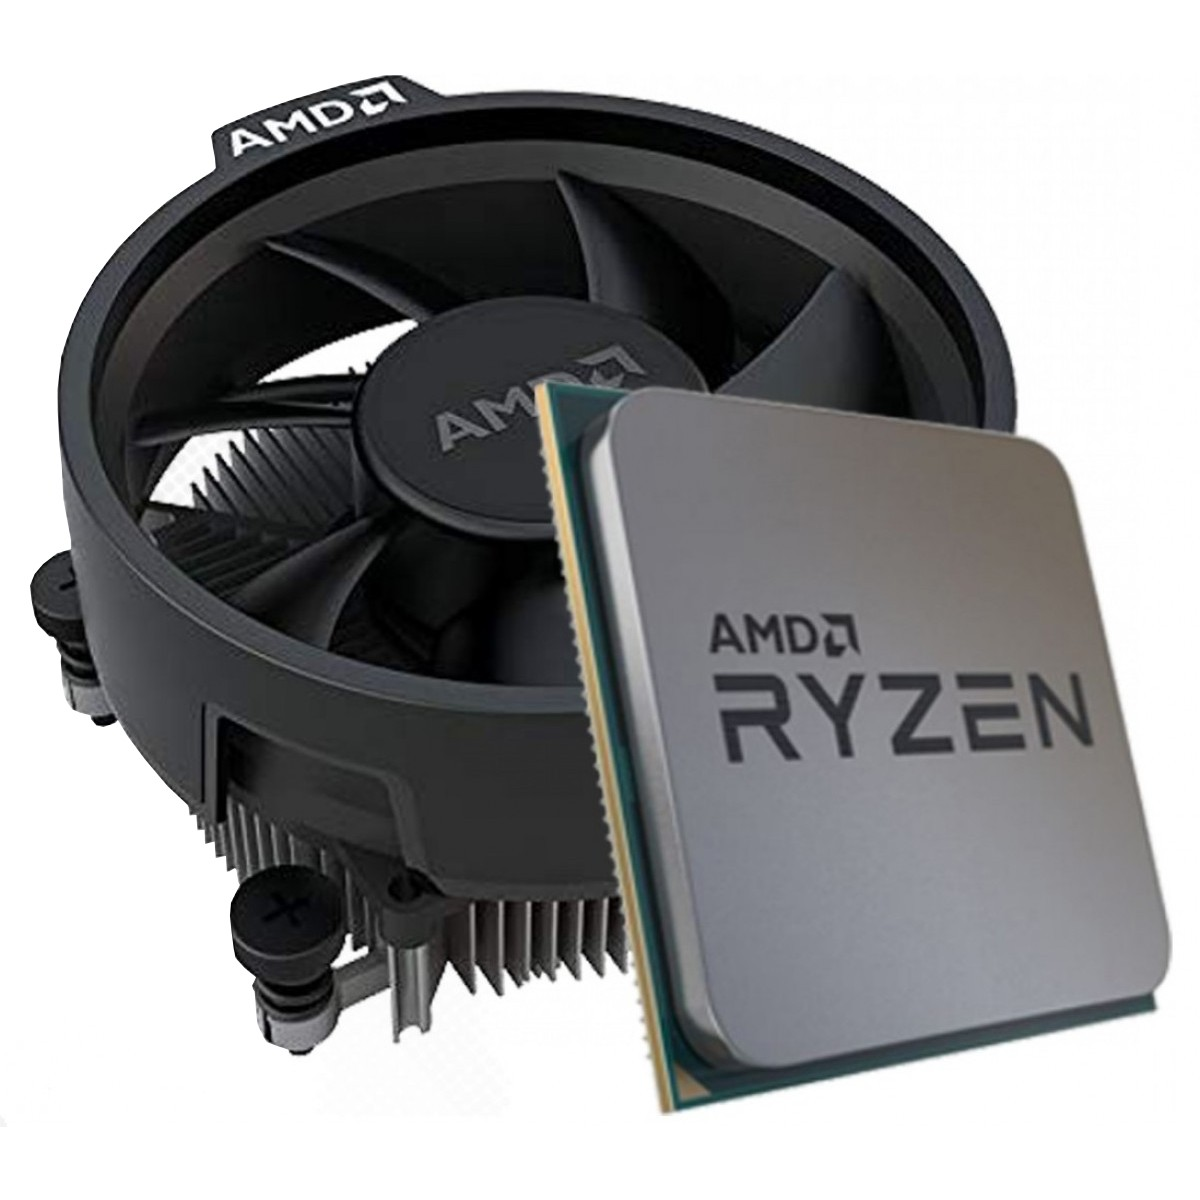 Processador AMD Ryzen 3 3300X 3.8GHz (4.3GHz Turbo), 4-Cores 8-Threads, Cooler Wraith Stealth, AM4